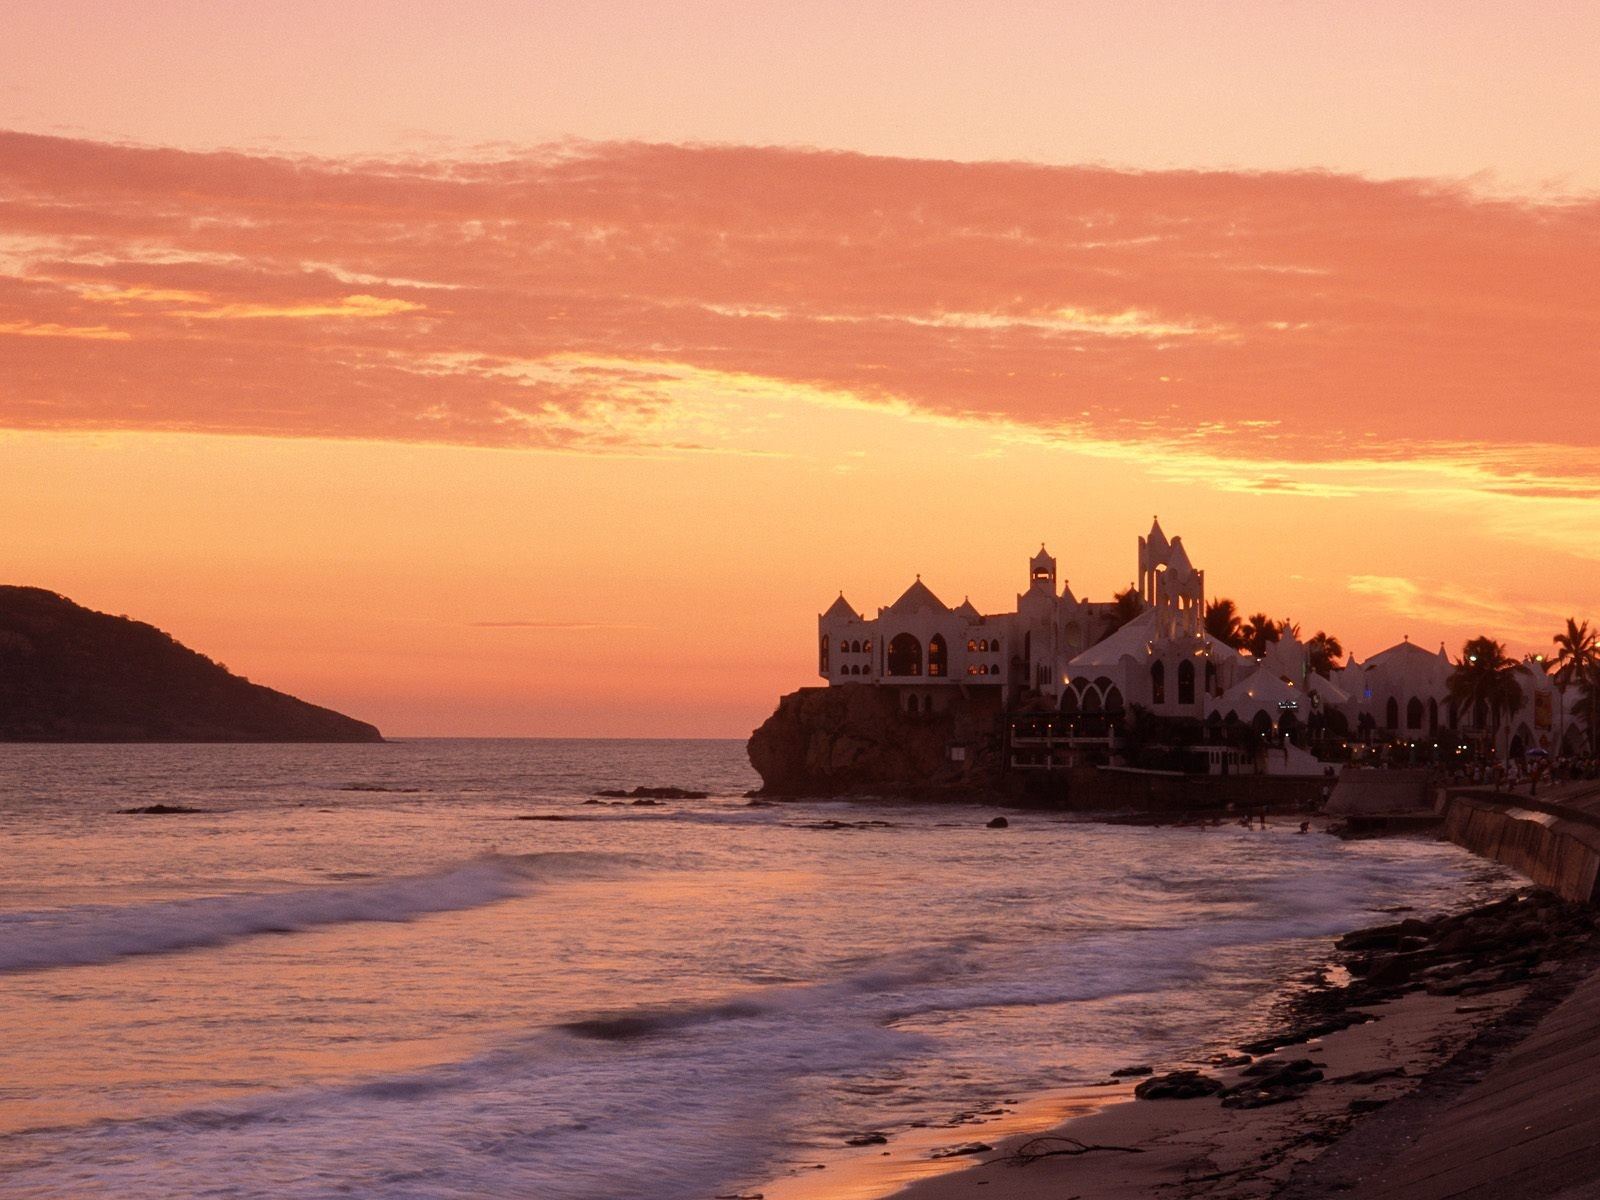 General 1600x1200 landscape Mexico resort coast dusk sunset skyscape